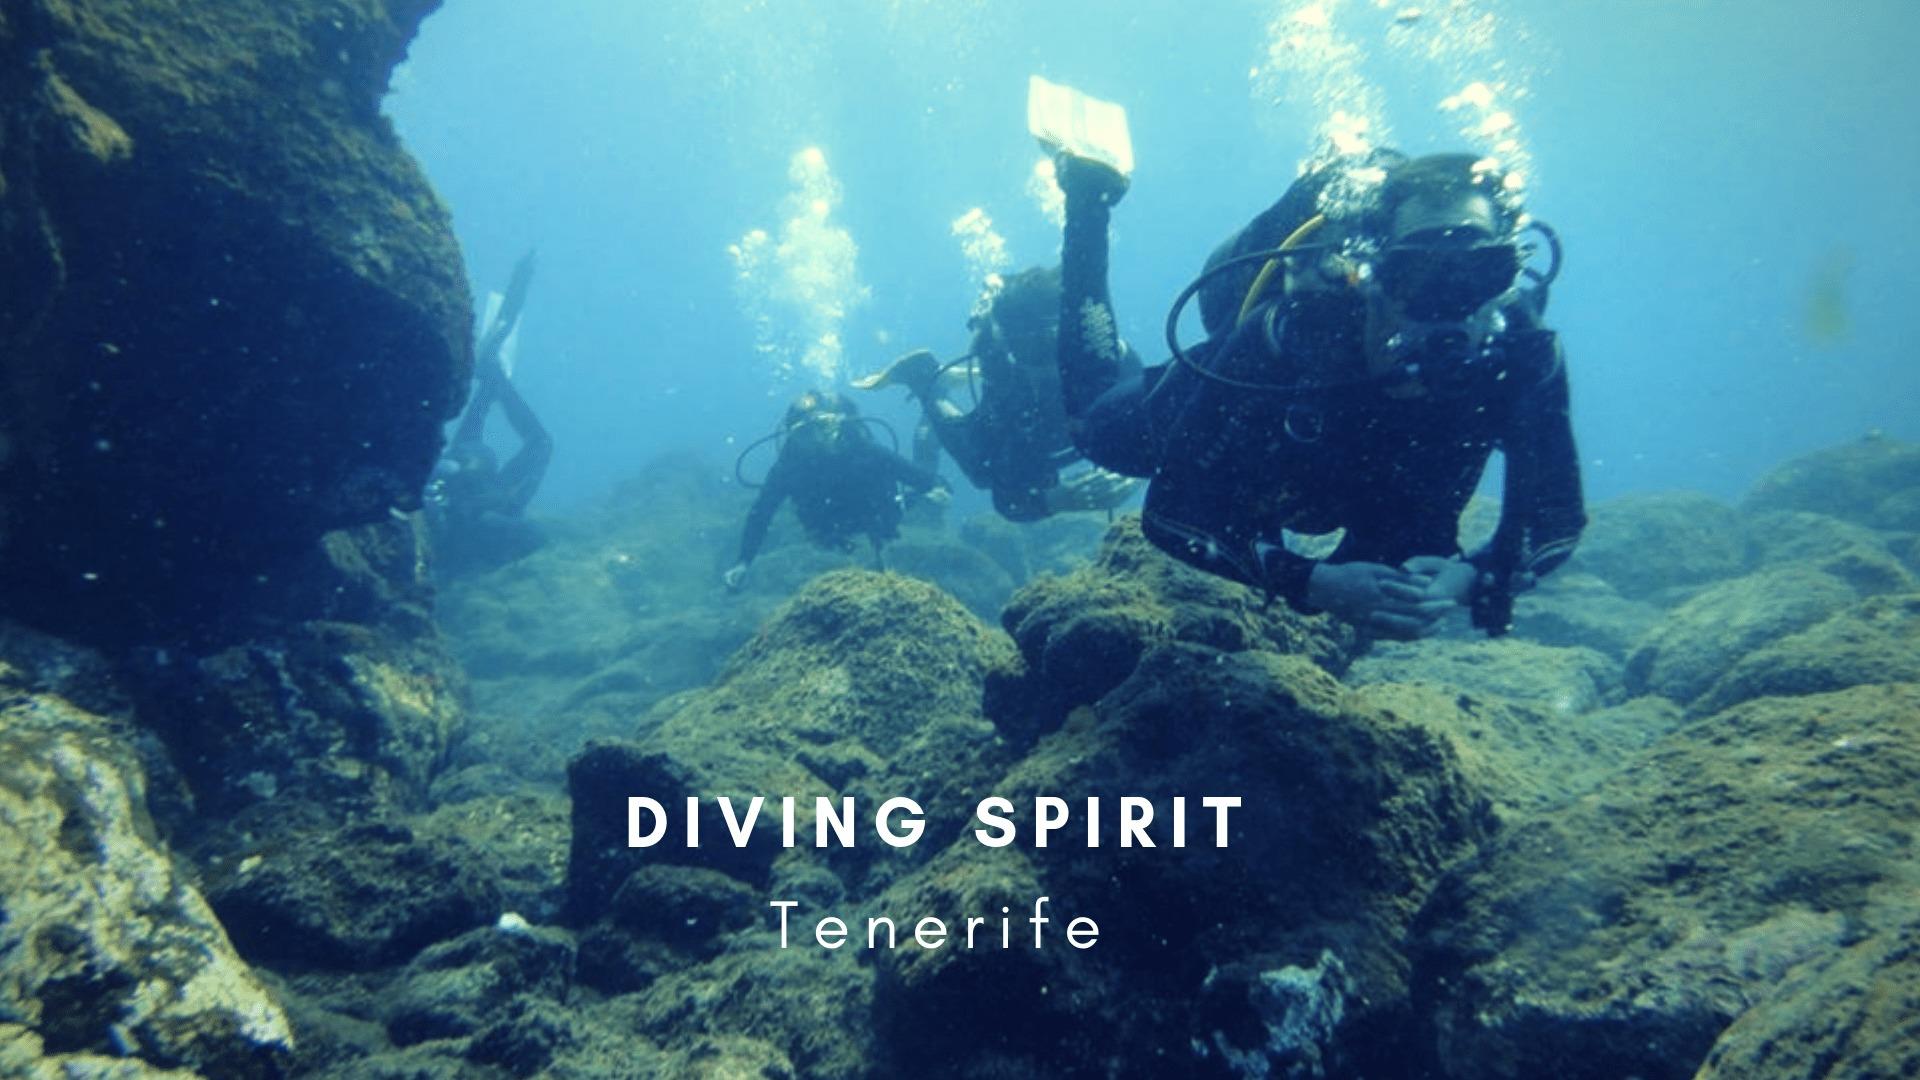 Diving Spirit Tenerife - Espiritu de buceo